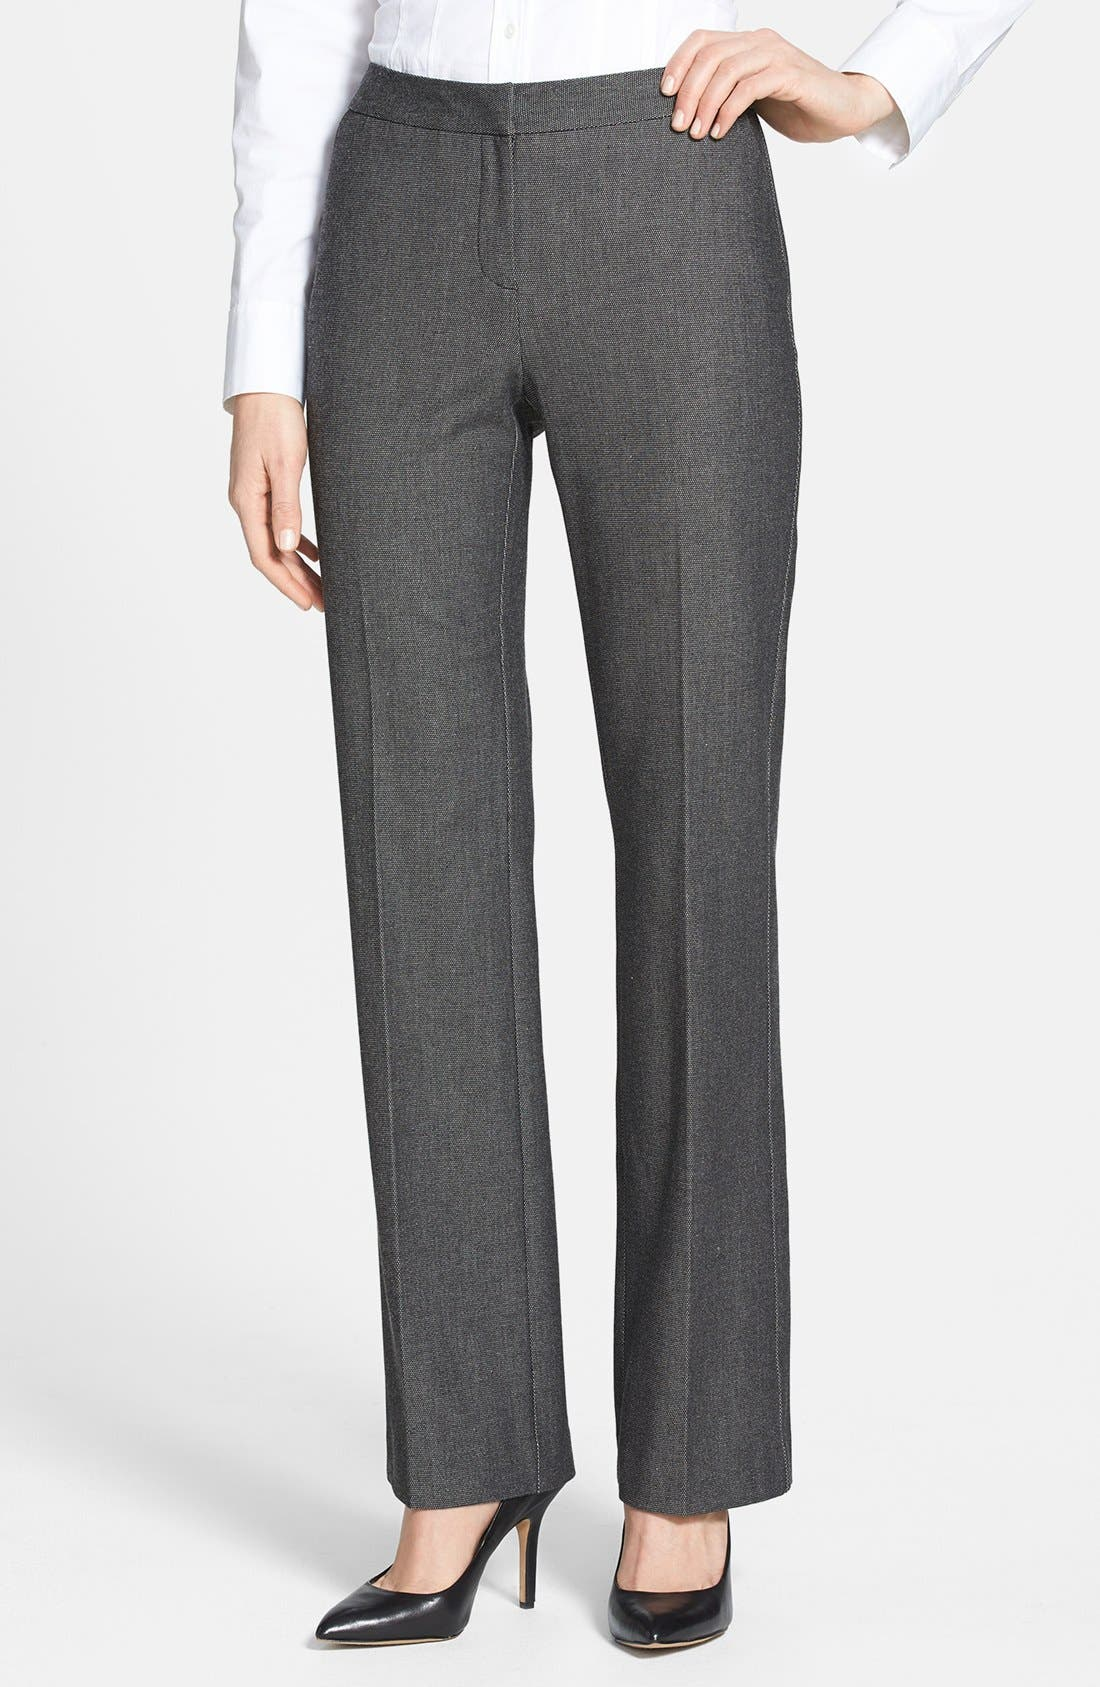 Alternate Image 1 Selected - Halogen® 'Taylor' Pin Dot Weave Pants (Petite)